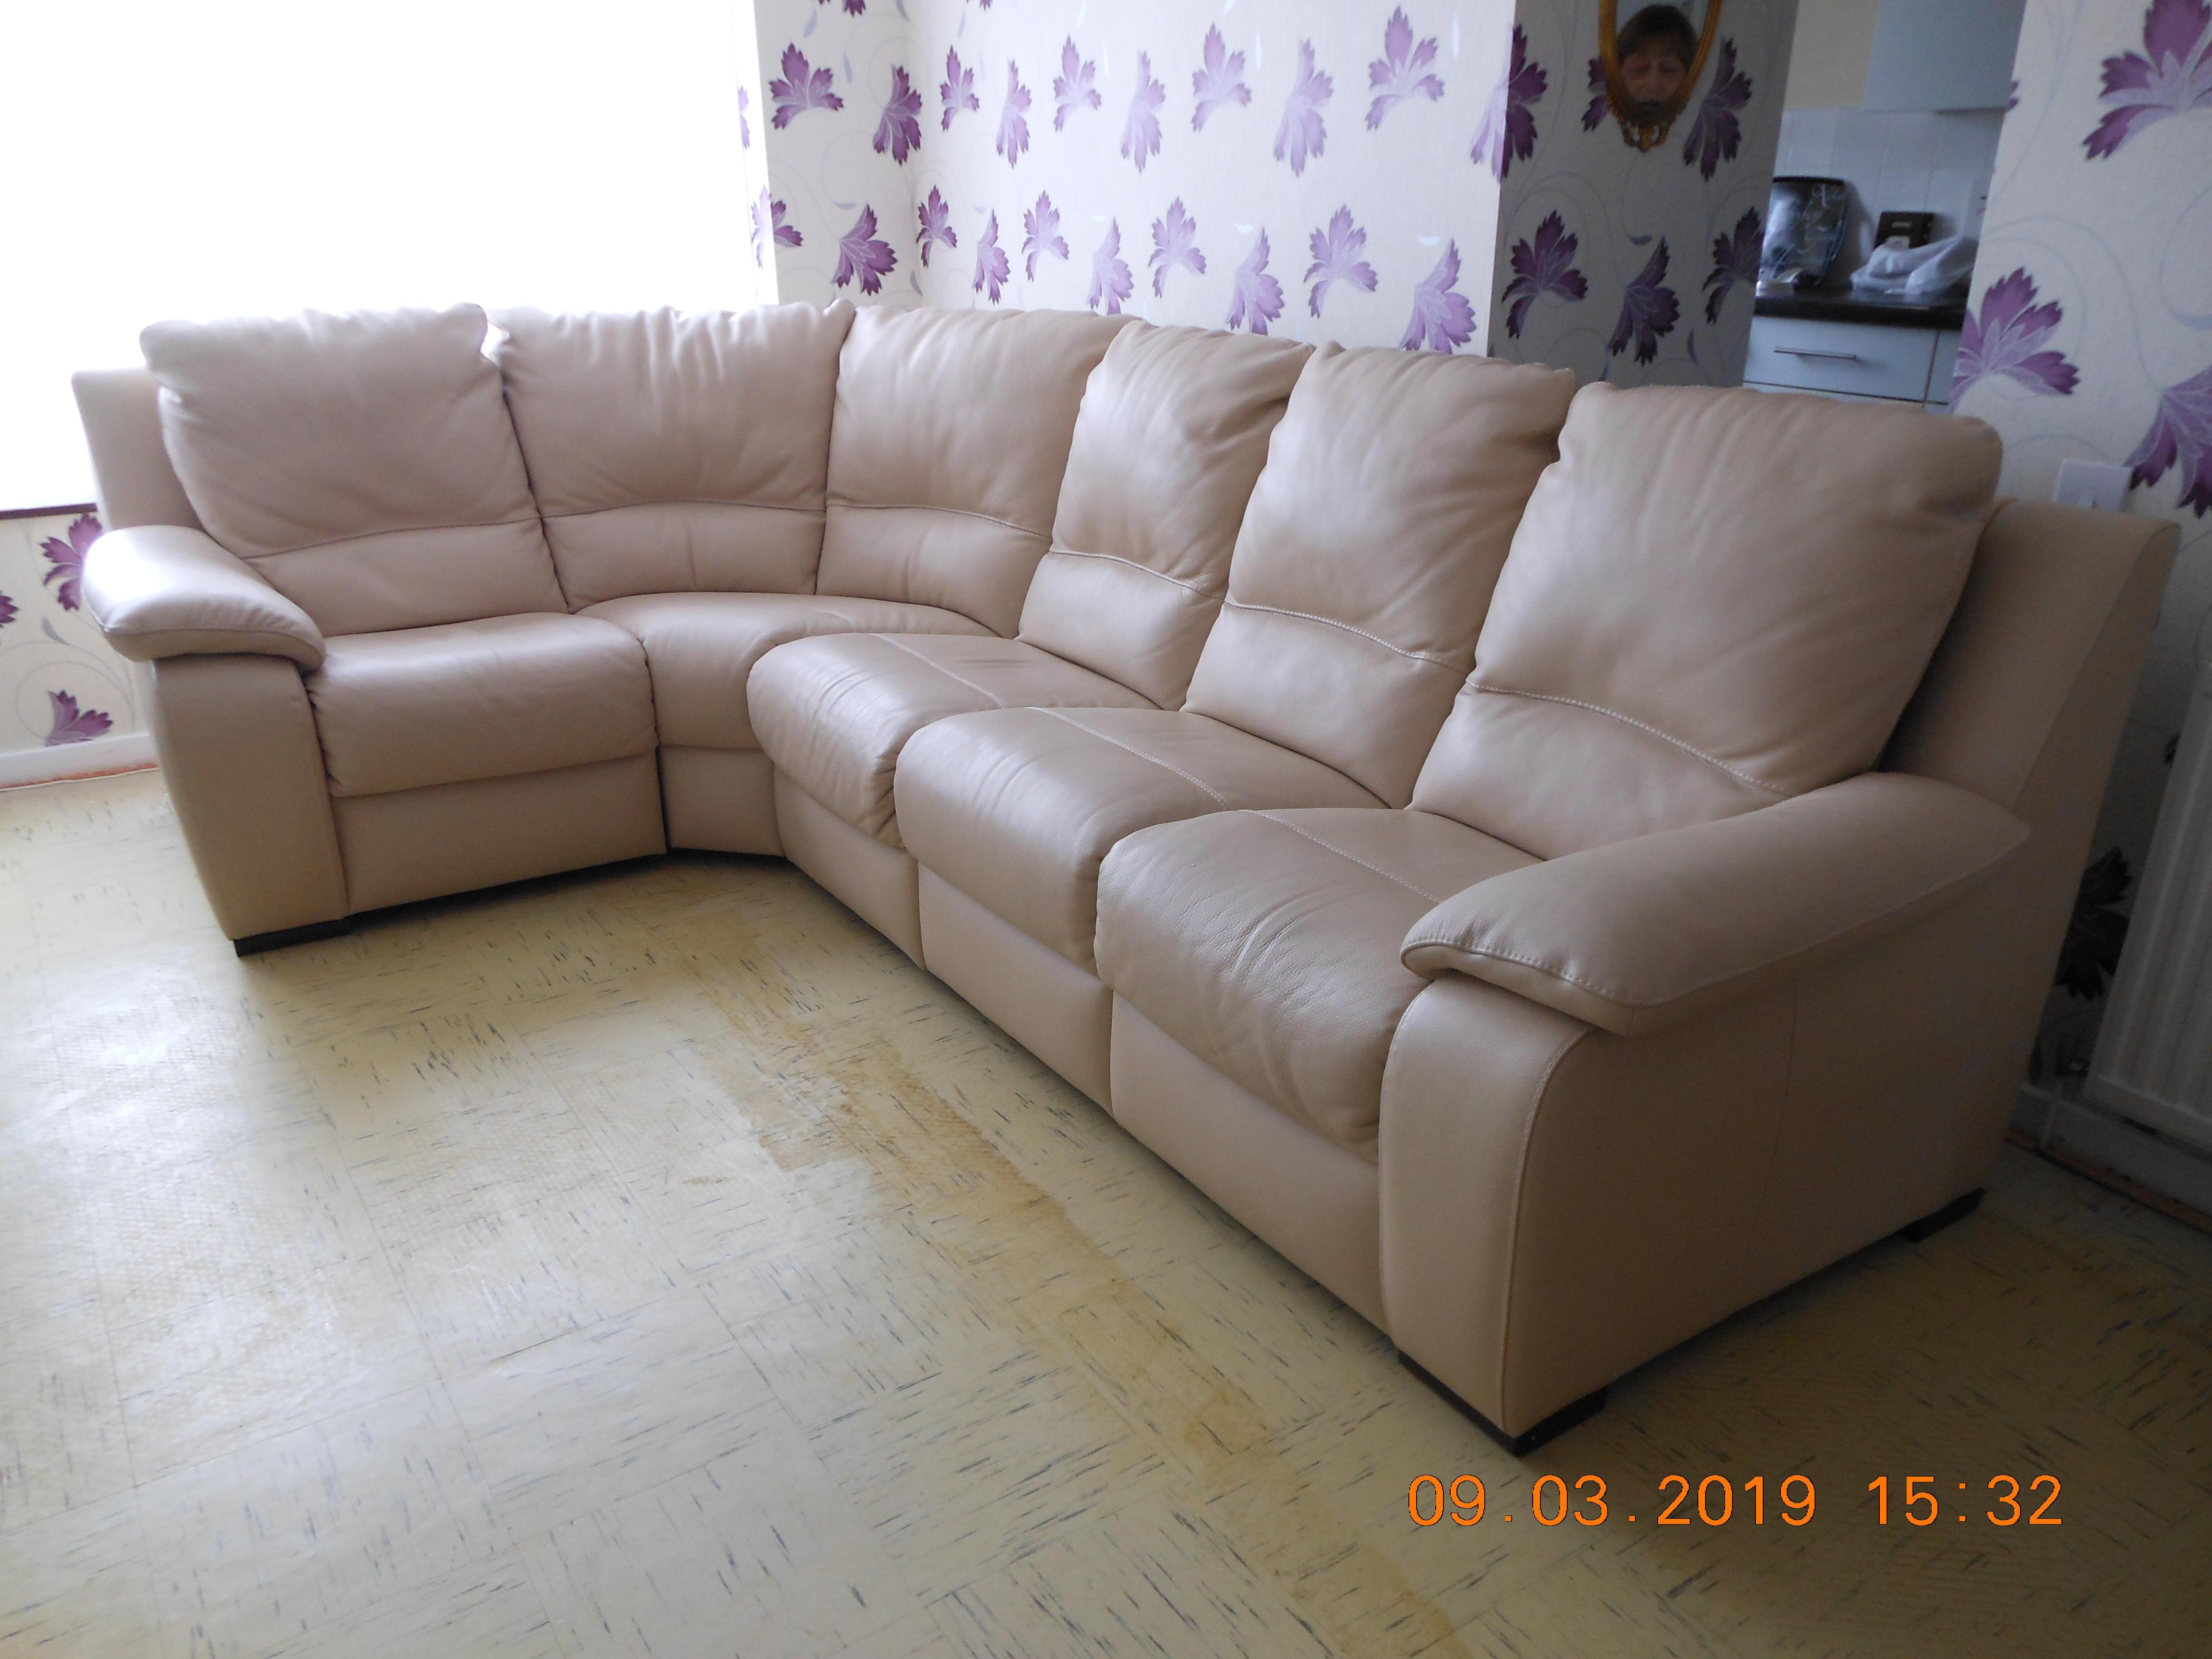 Corner Sofa Unit - All Leather - High quality, adaptable